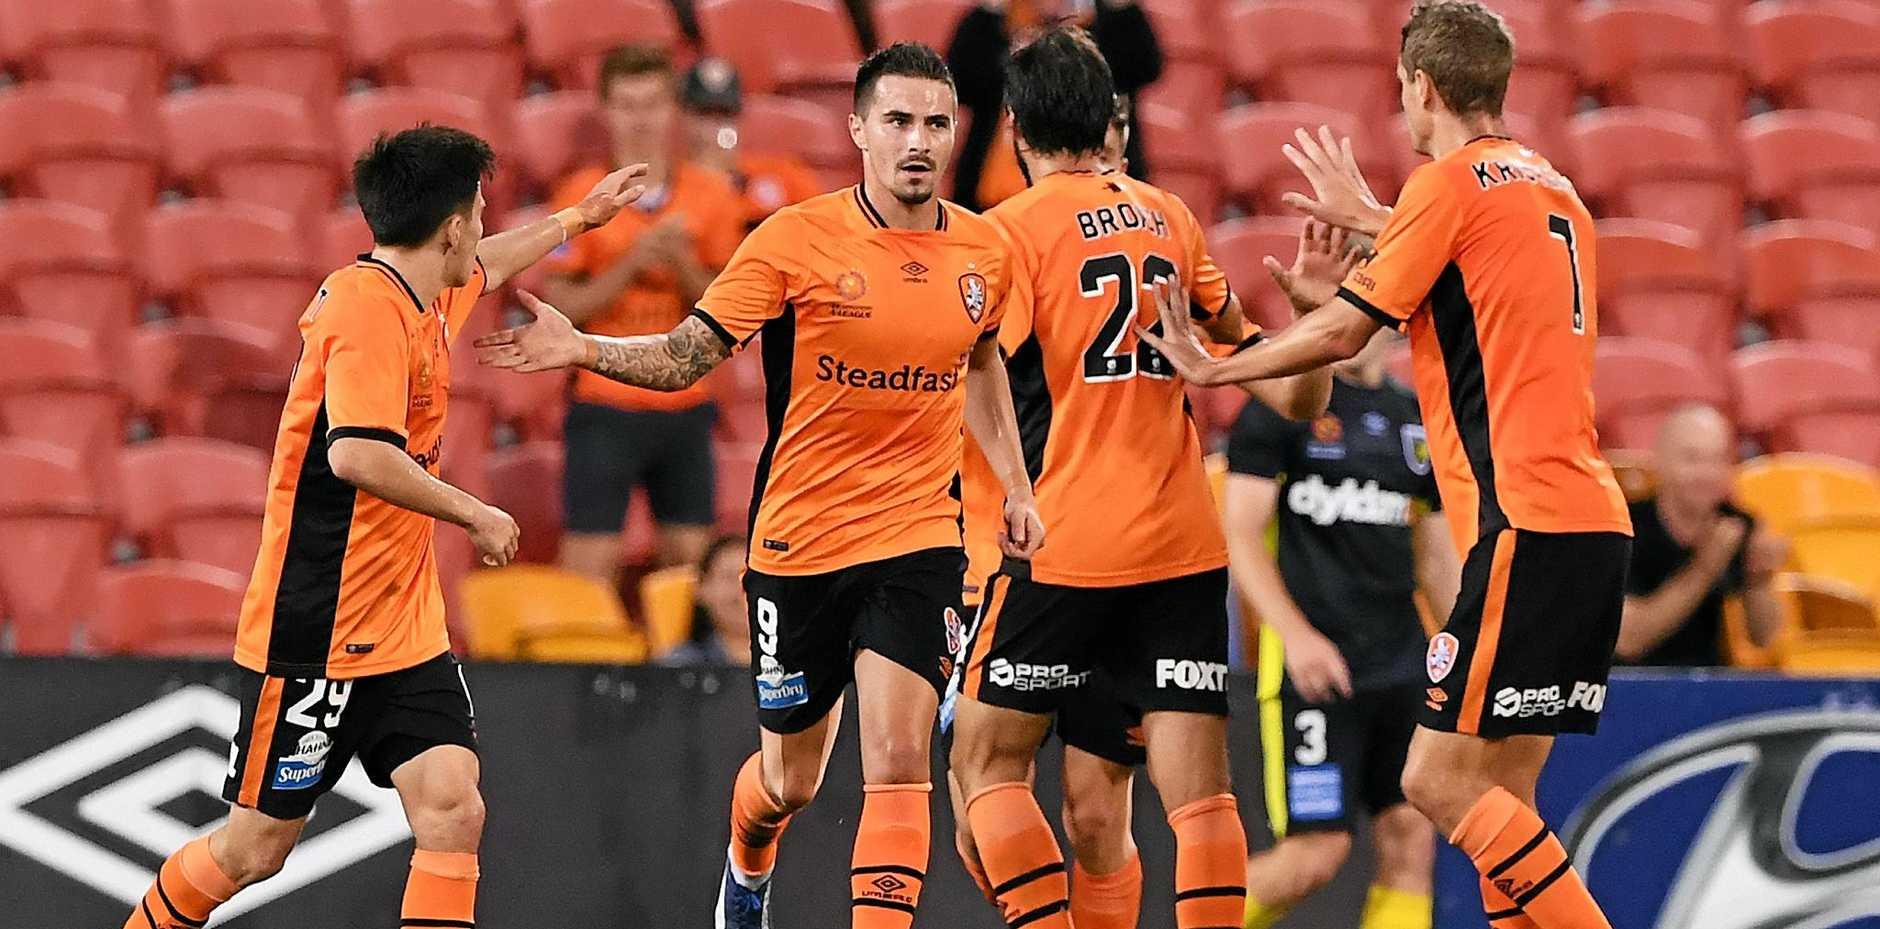 Jamie Maclaren (centre) celebrates after scoring one of his three goals against Central Coast.